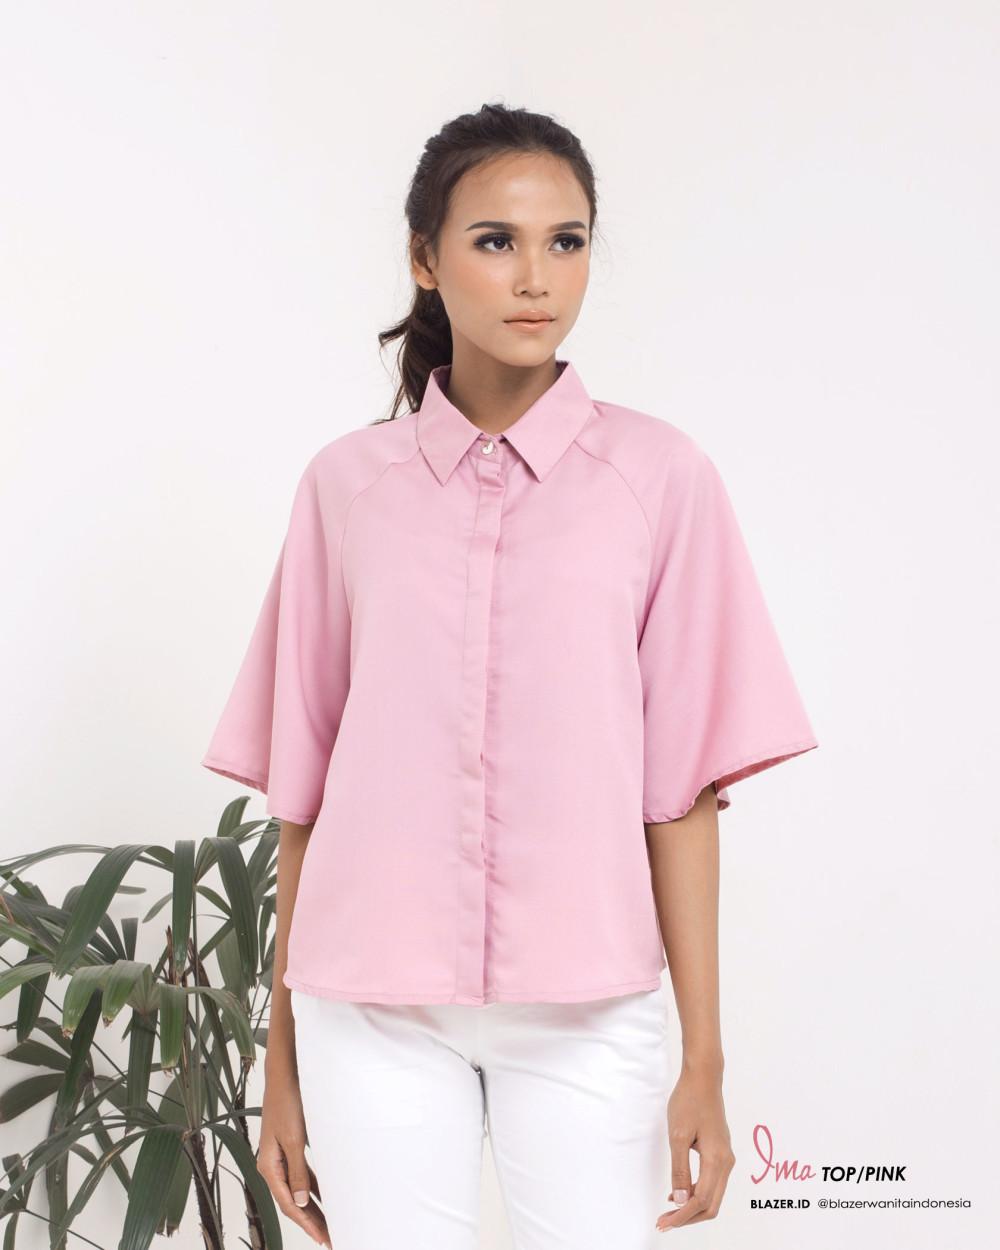 Ima Top Blush Pink Blouse Baju Kantor Wanita Prevnext